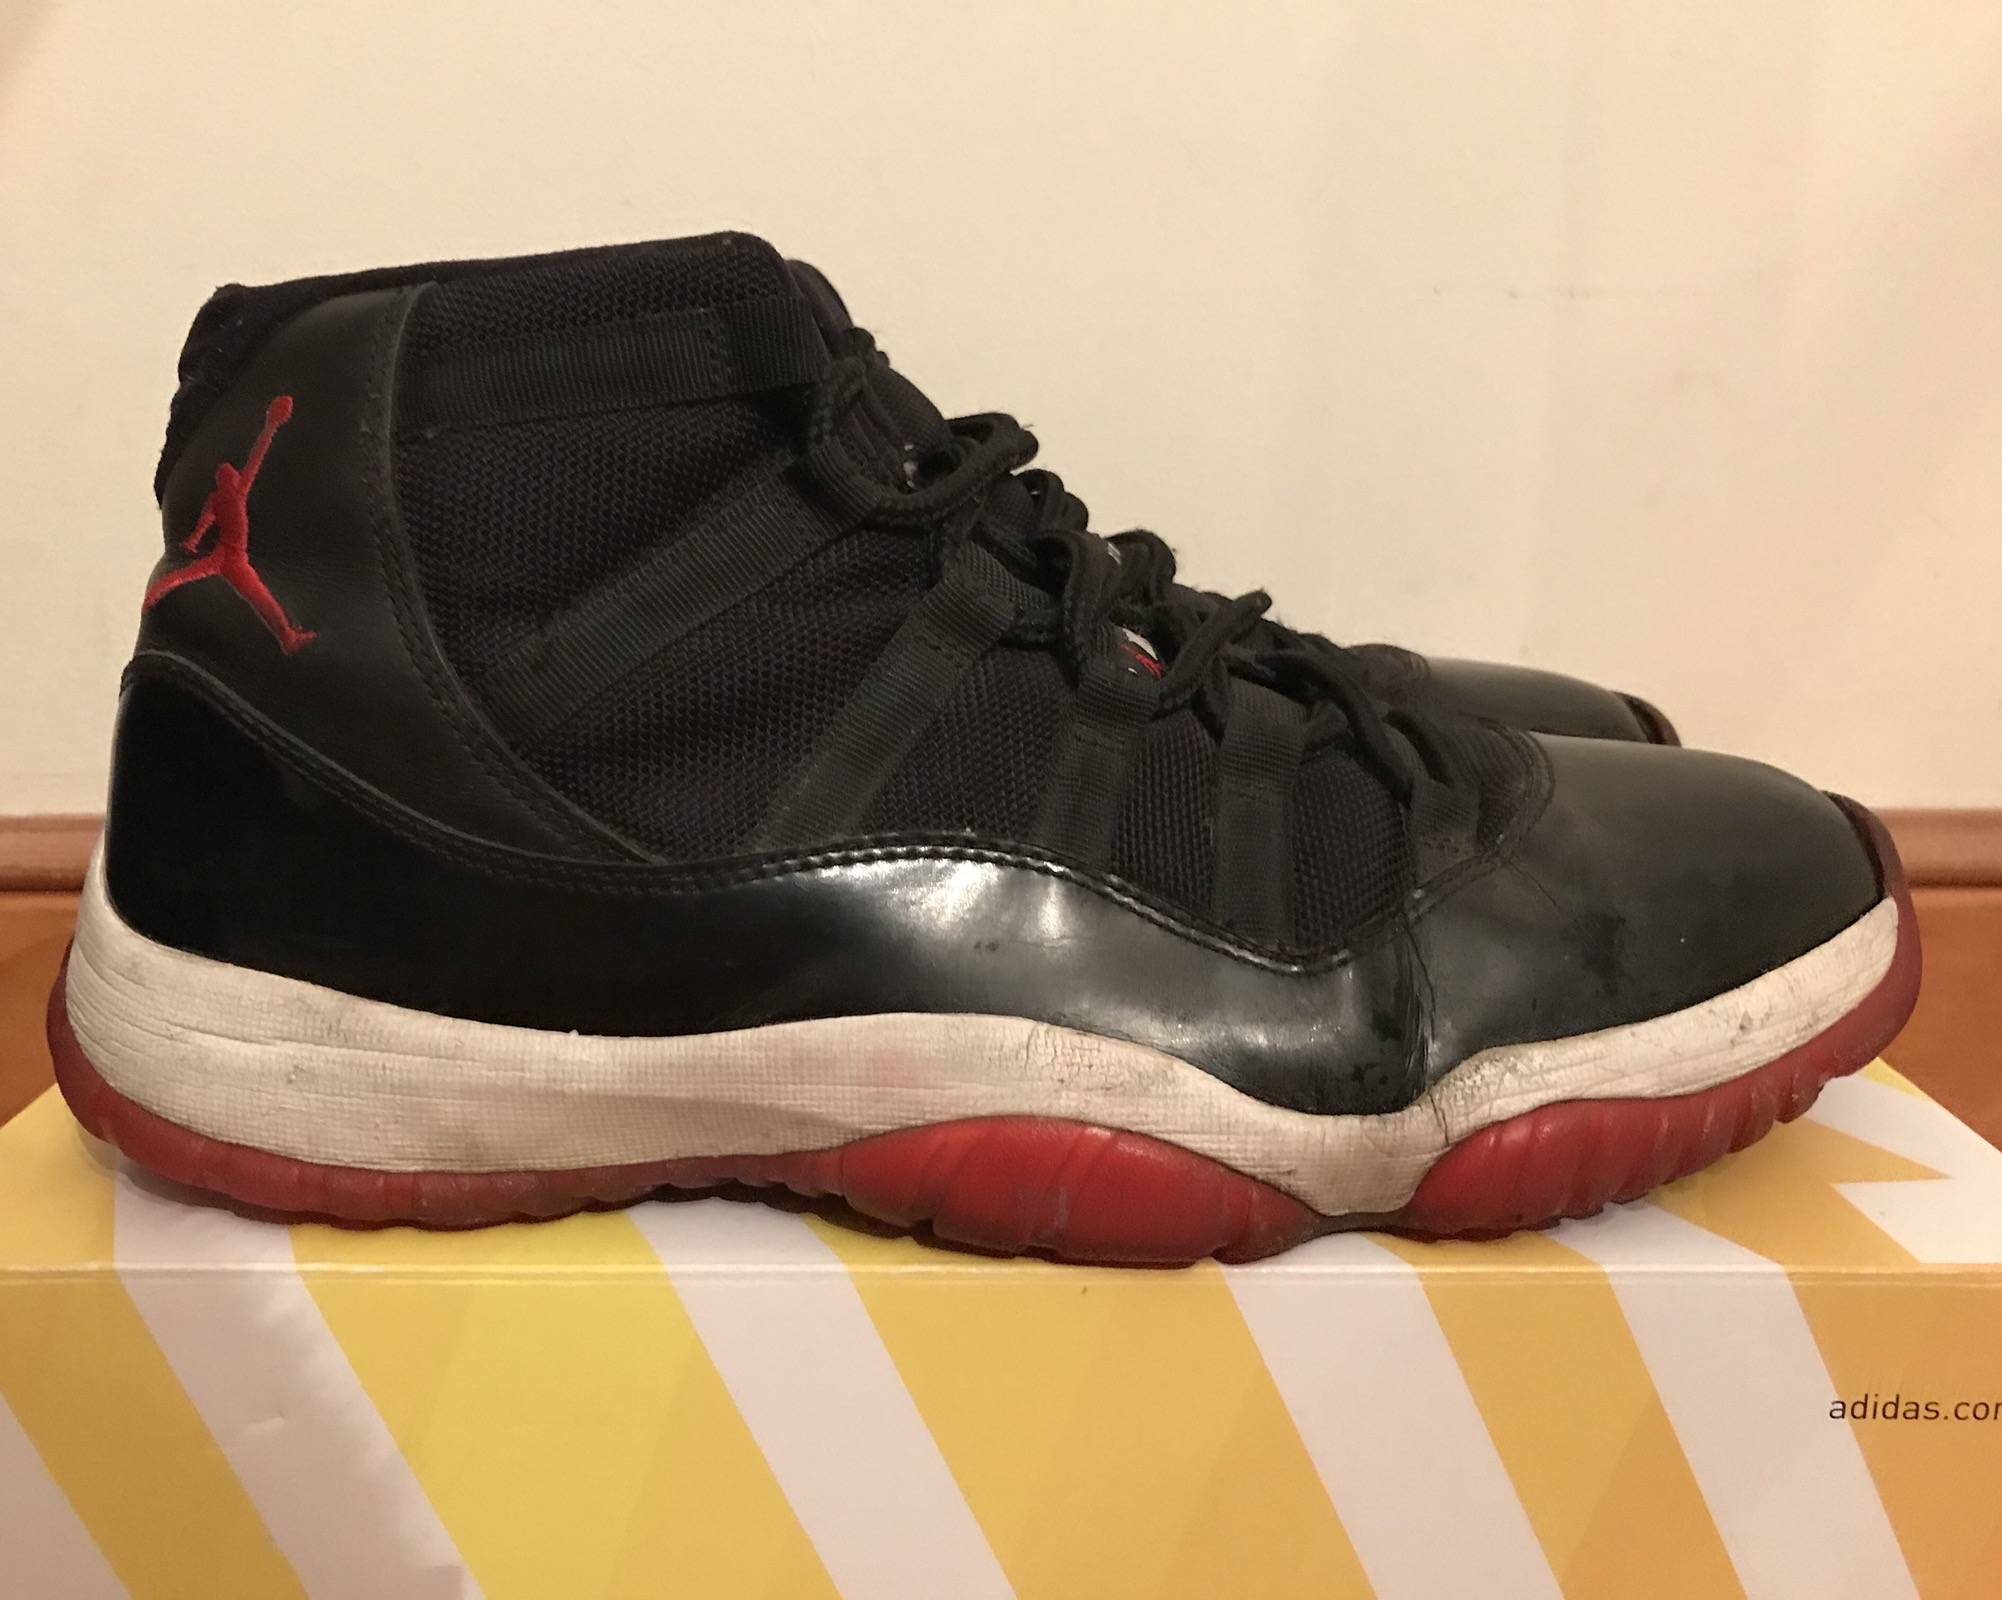 "e6bdb3cfec1eb9 Jordan Brand RETRO 11 ""BRED PLAYOFFS"" 2012 Size 10.5 - Hi-Top Sneakers for  Sale - Grailed"